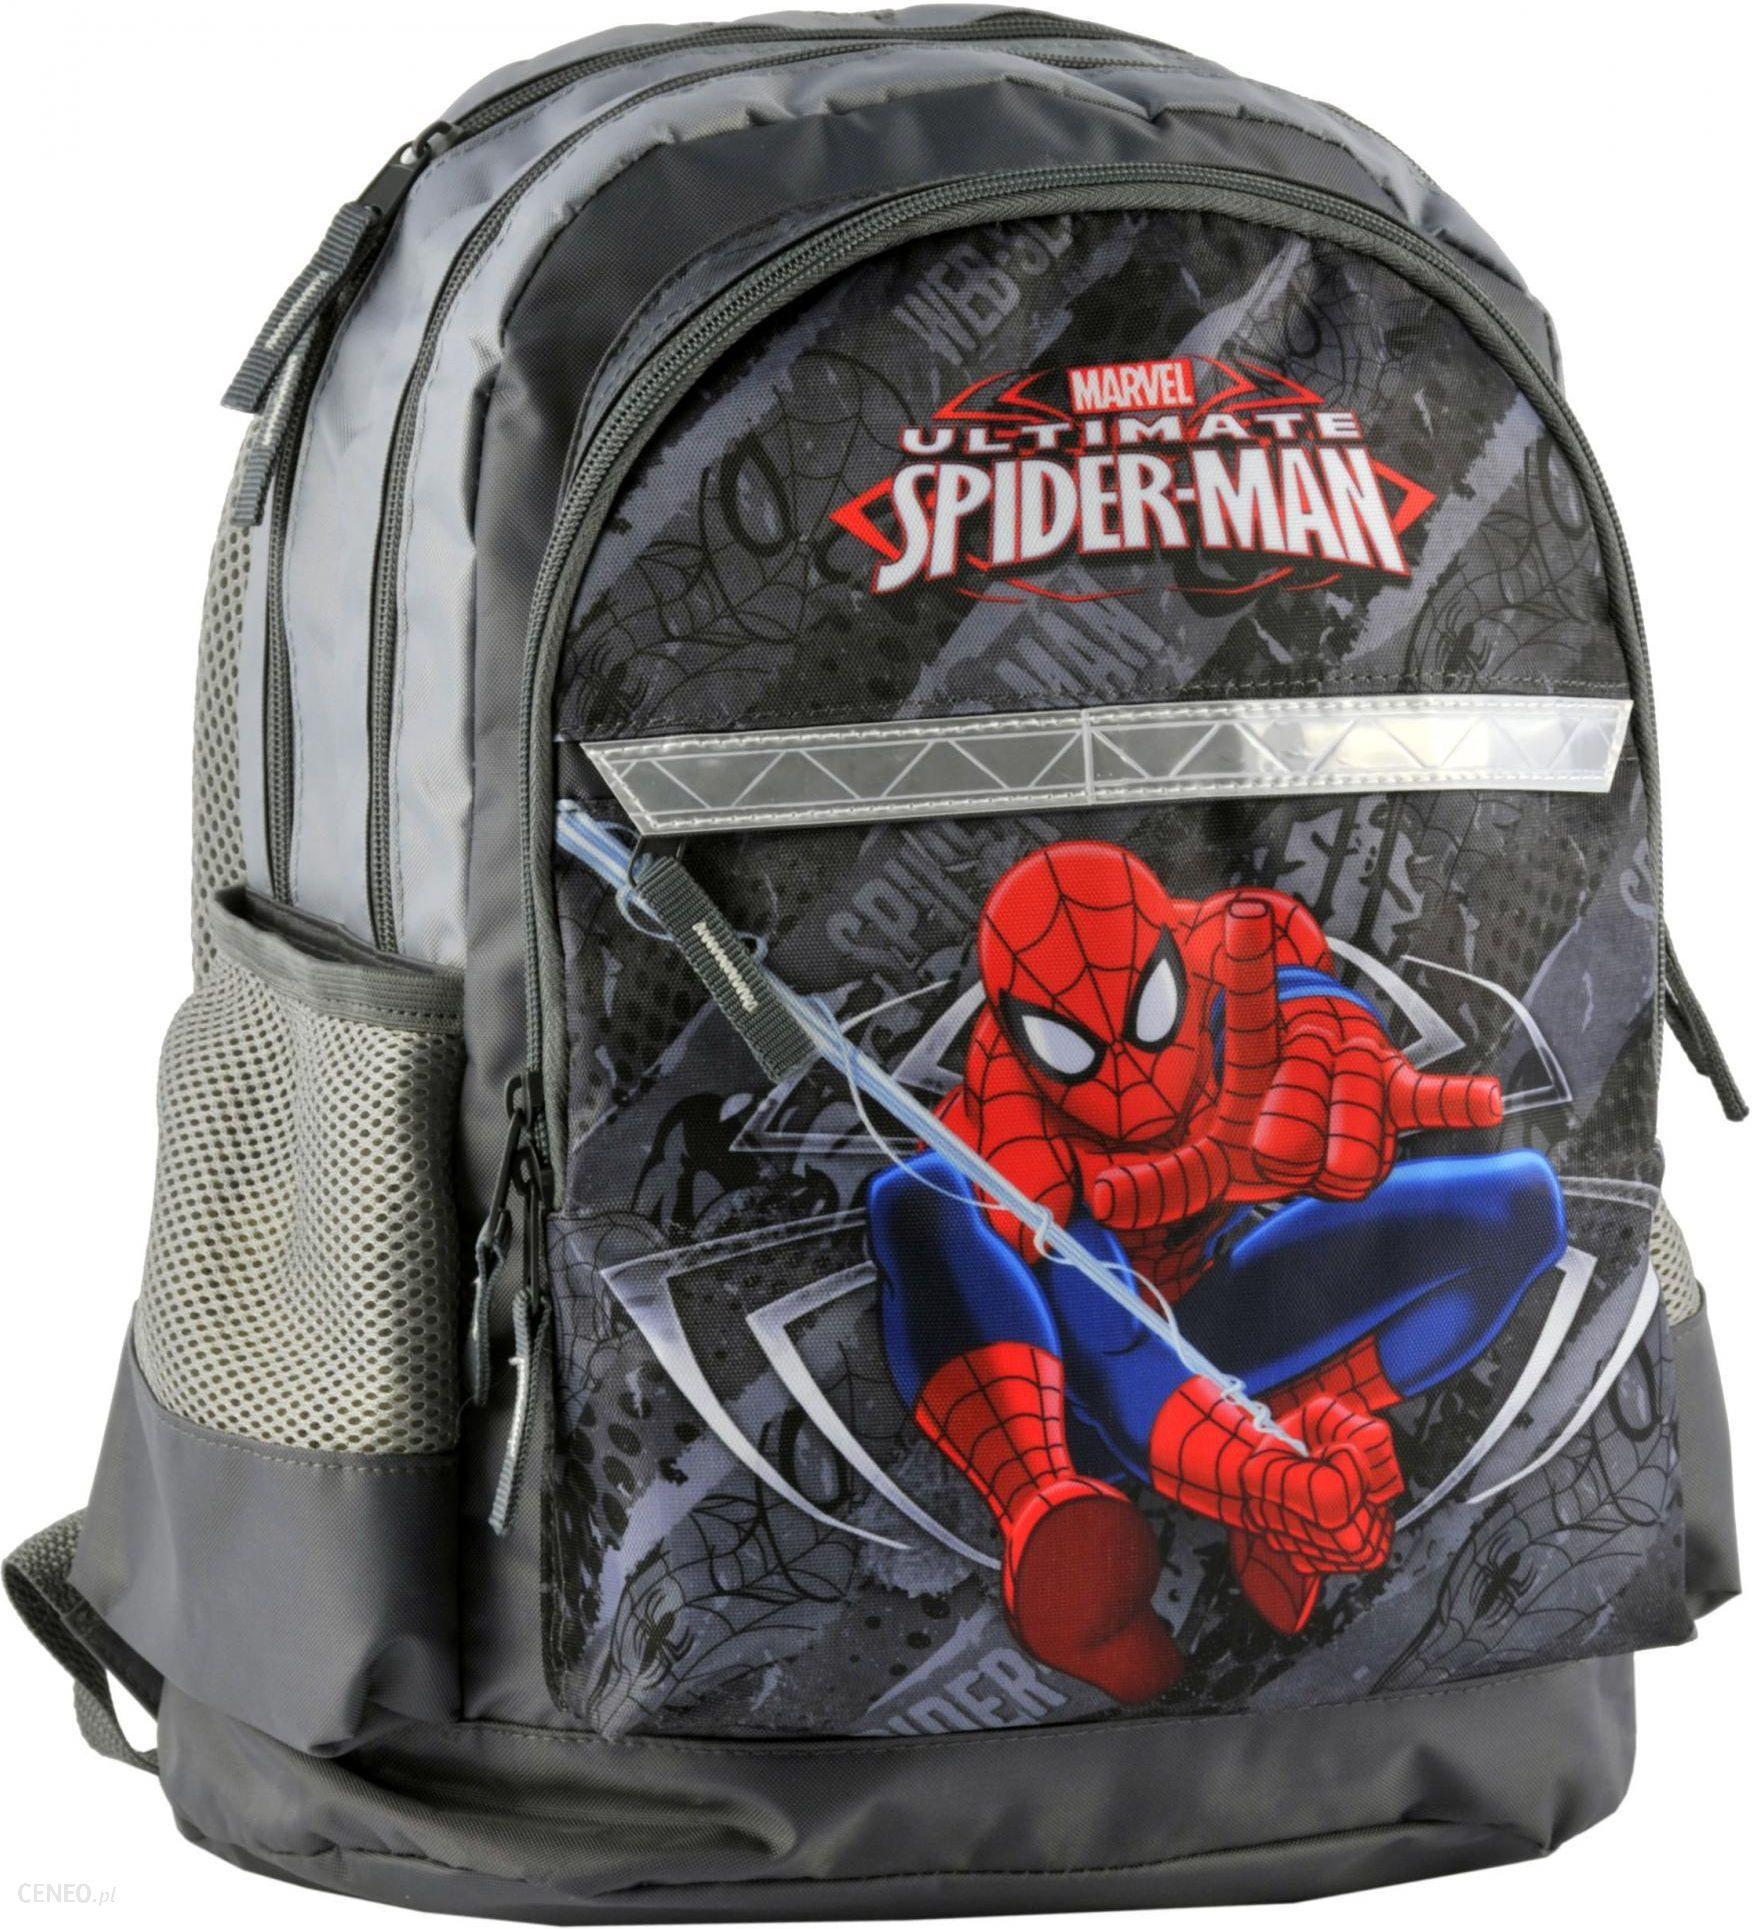 94377dd10652e Plecak Spiderman - Ceny i opinie - Ceneo.pl